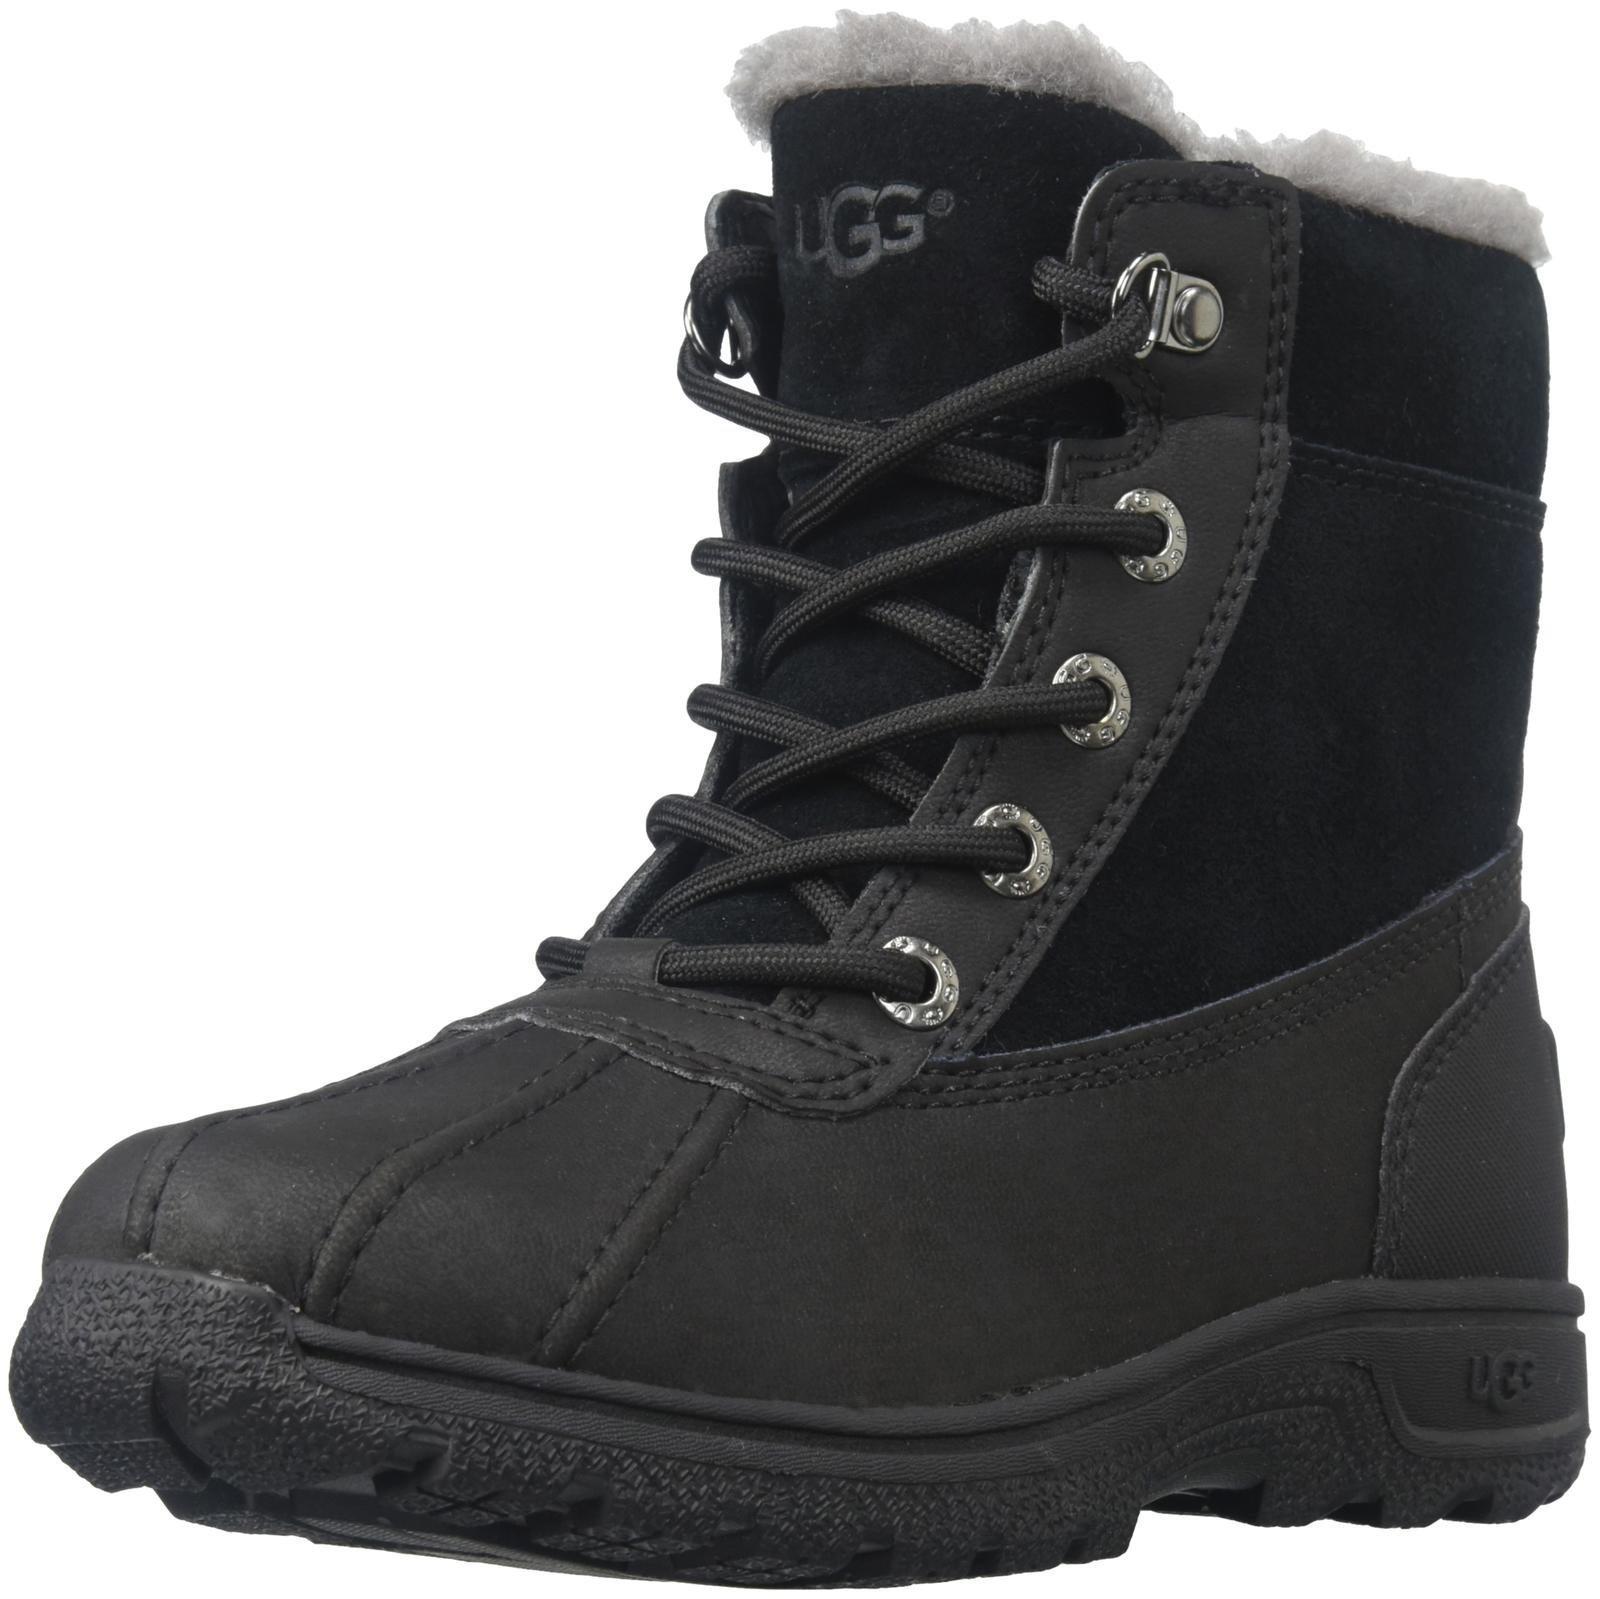 UGG Baby K Leggero Lace-up Boot, Black, 1 M US Little Kid